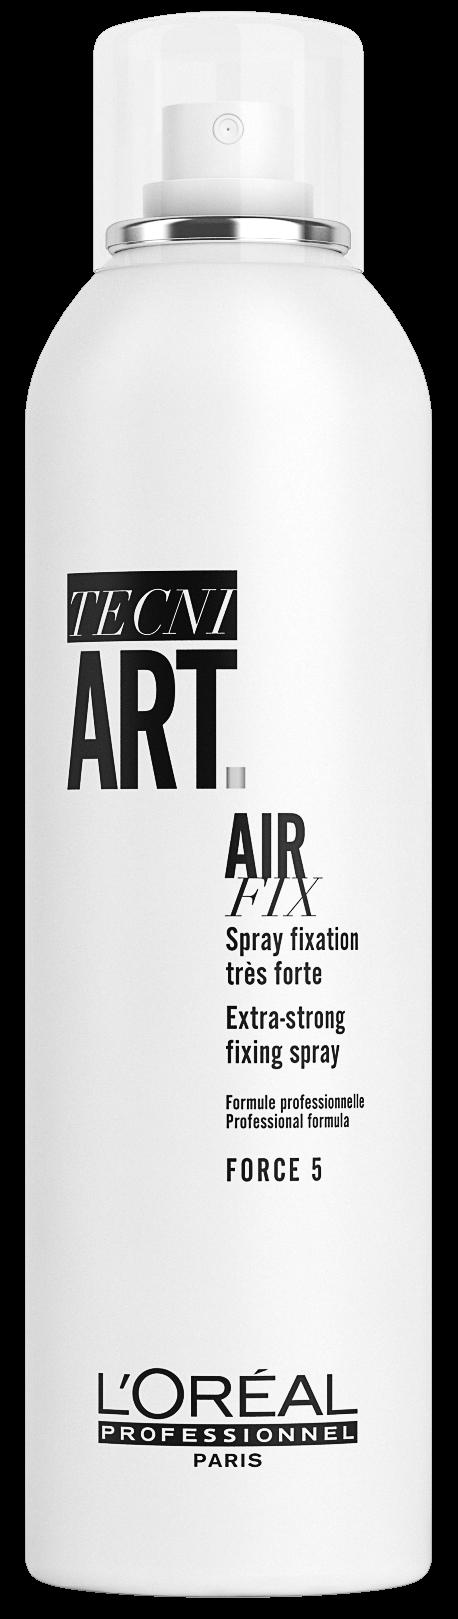 L'Oreal Professionnel Спрей TecniArt Air Fix Эр Фикс Моментальной Фиксации с Защитой от Влаги фикс.5/6, 250 мл спрей сильной фиксации с защитой от влаги и уф лучей l oreal professionnel tecni art fix anti frizz 400 мл